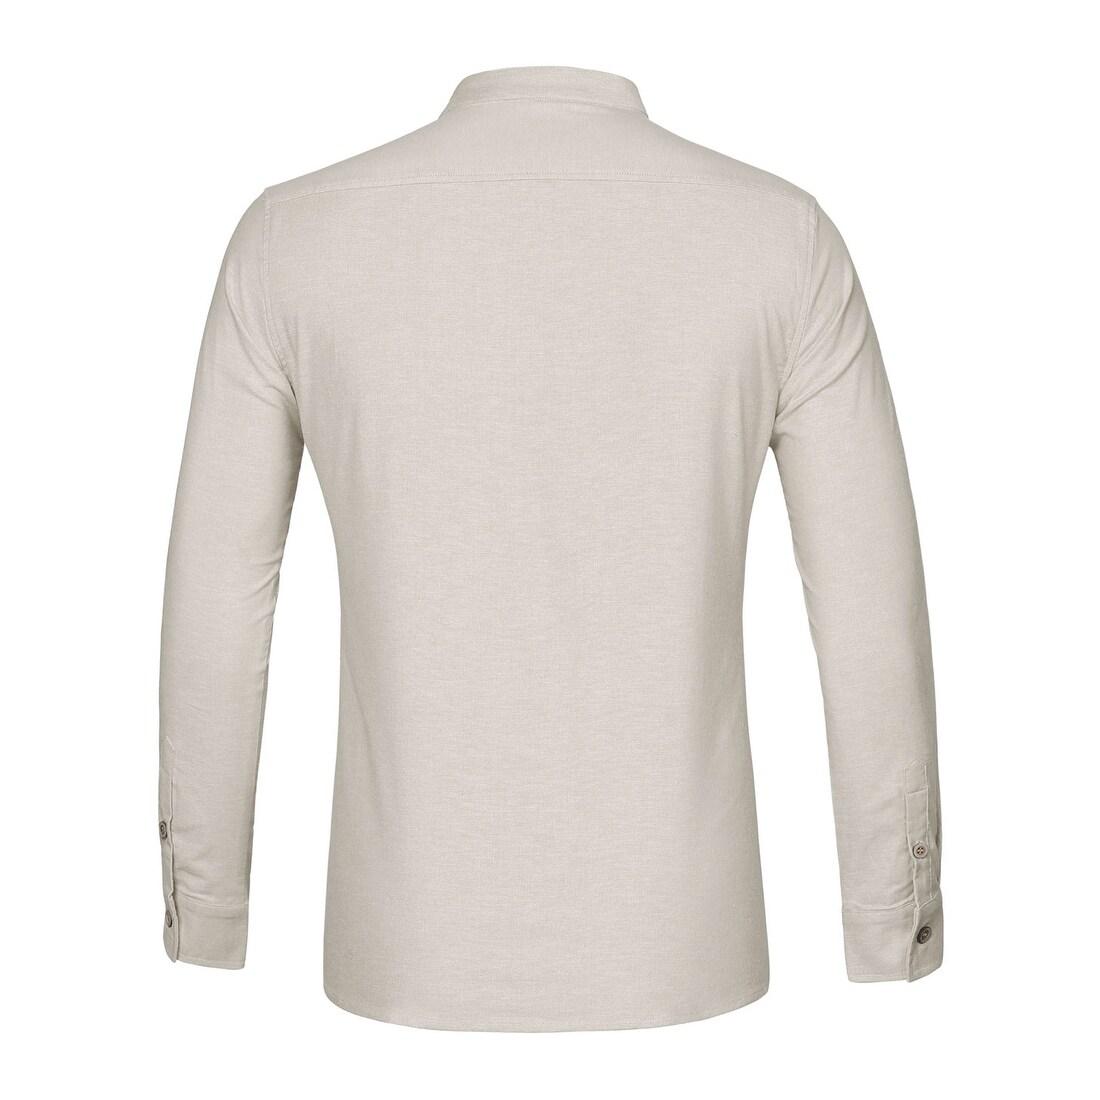 Men/'s Henley Short Sleeve Cotton Shirt Collar Loops Smart Grandad White Black WA